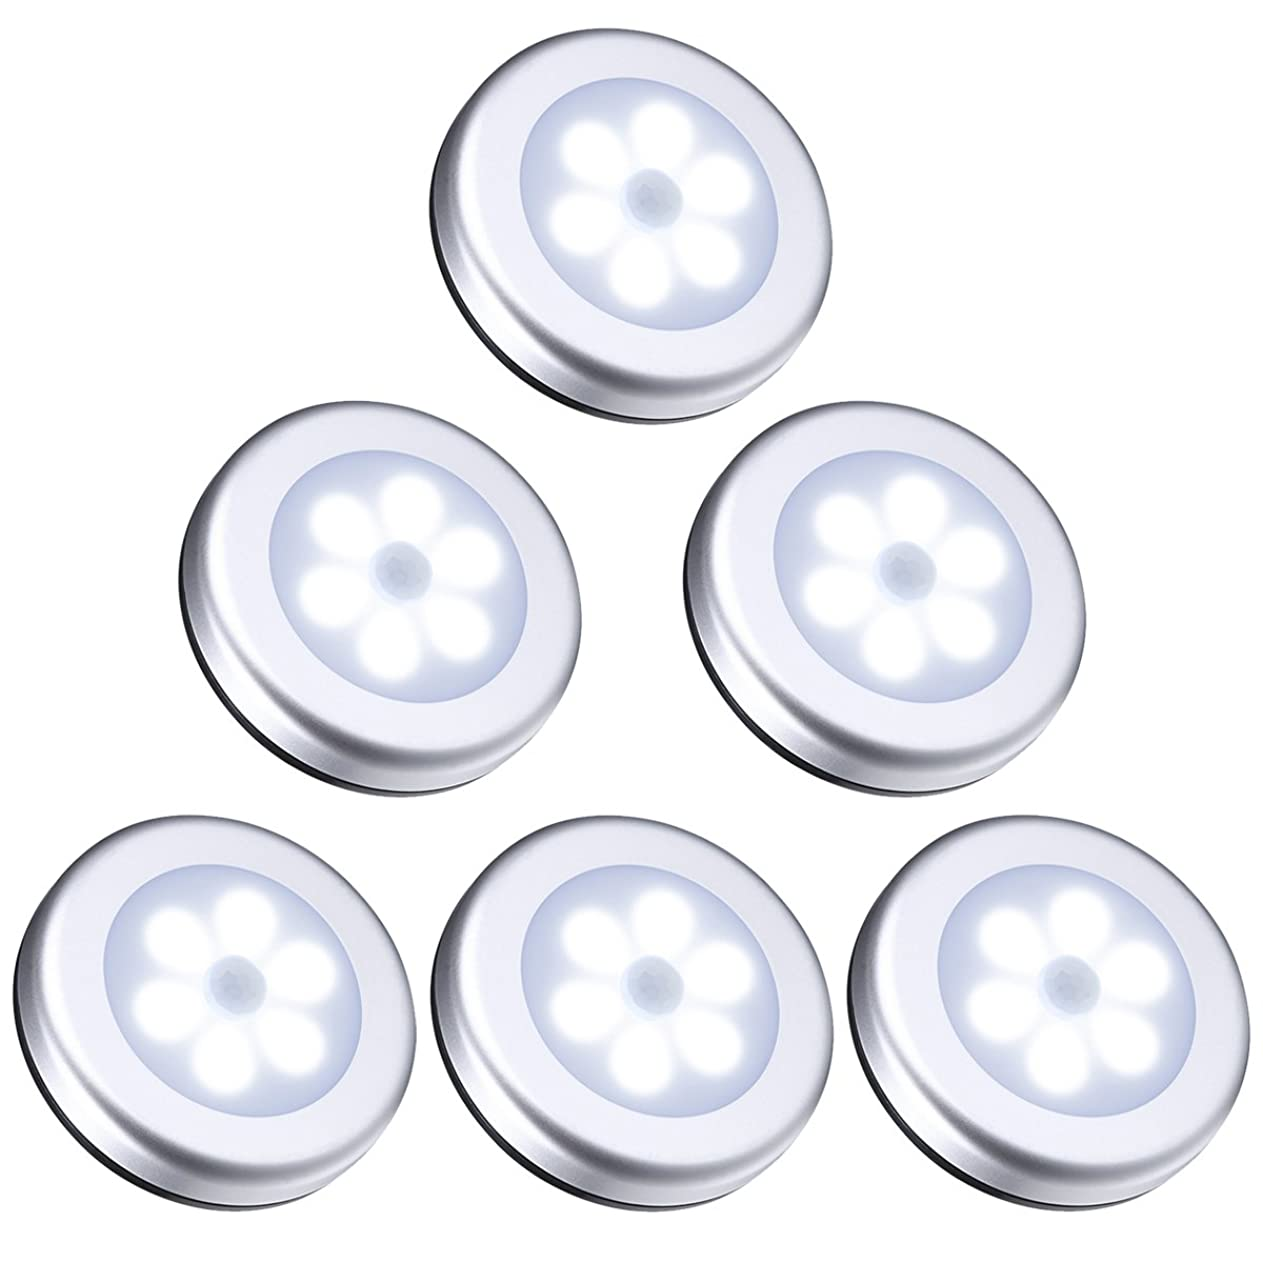 ORIA 人感センサーライト 電池式 LEDライト 屋内 小型 マグネット付き 自動点灯 消灯 懐中電灯 設置便利 軽量 玄関 階段 クローゼット 押入れ ロッカー 夜間ライト 地震 停電 緊急照明 6LED 6個セット 昼白色